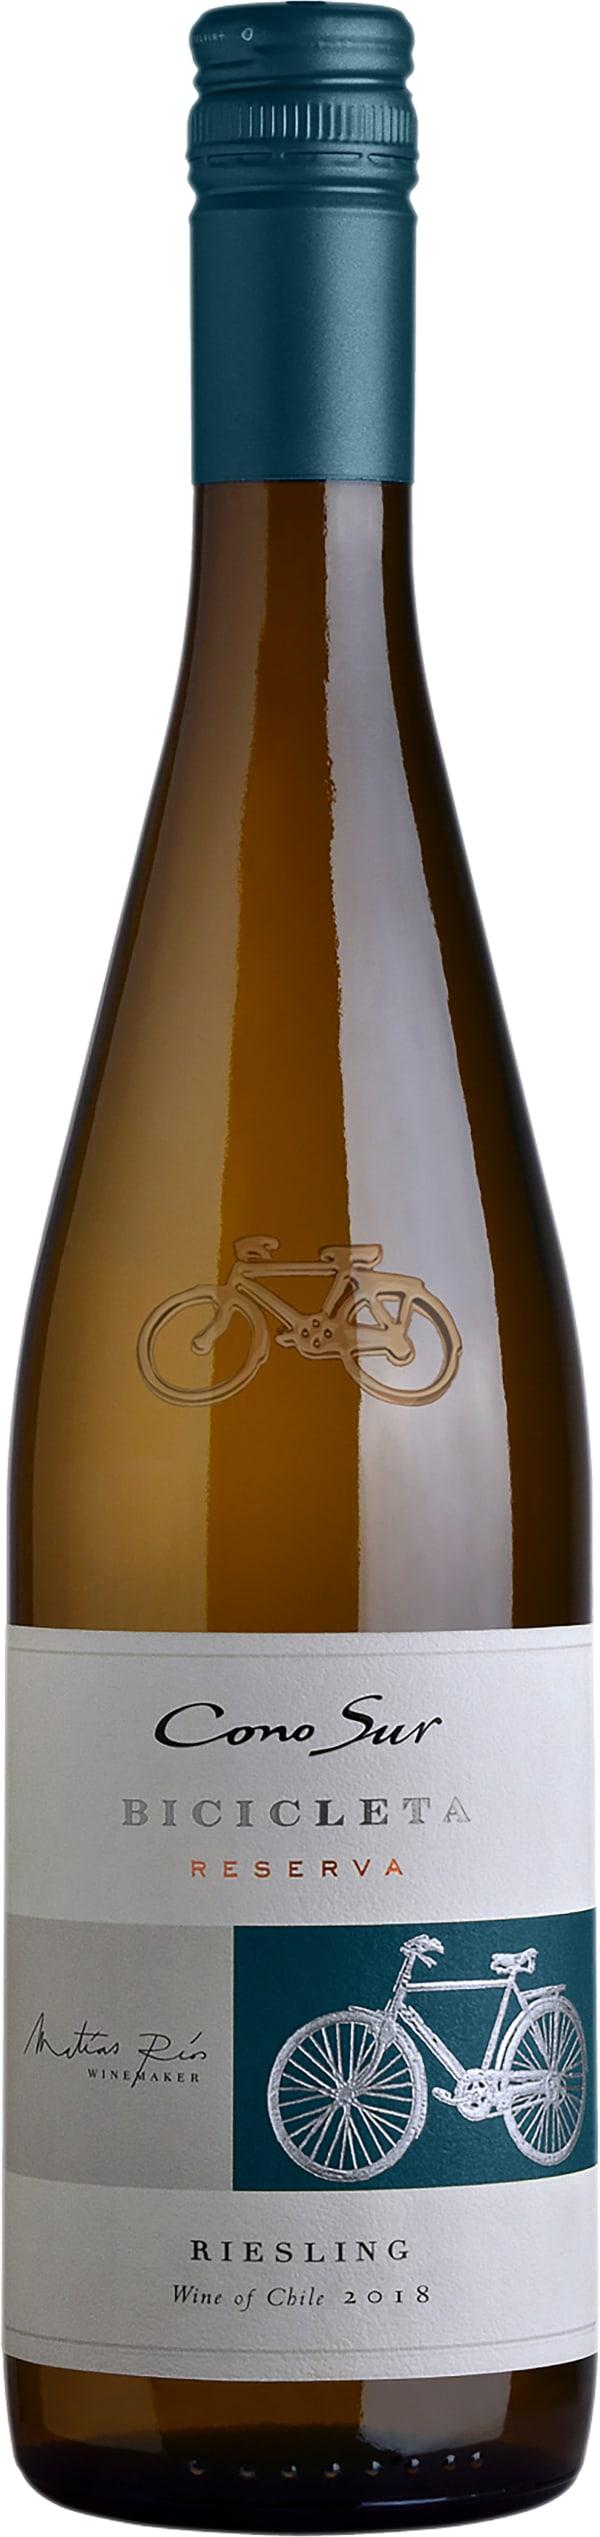 Cono Sur Bicicleta Riesling 2017